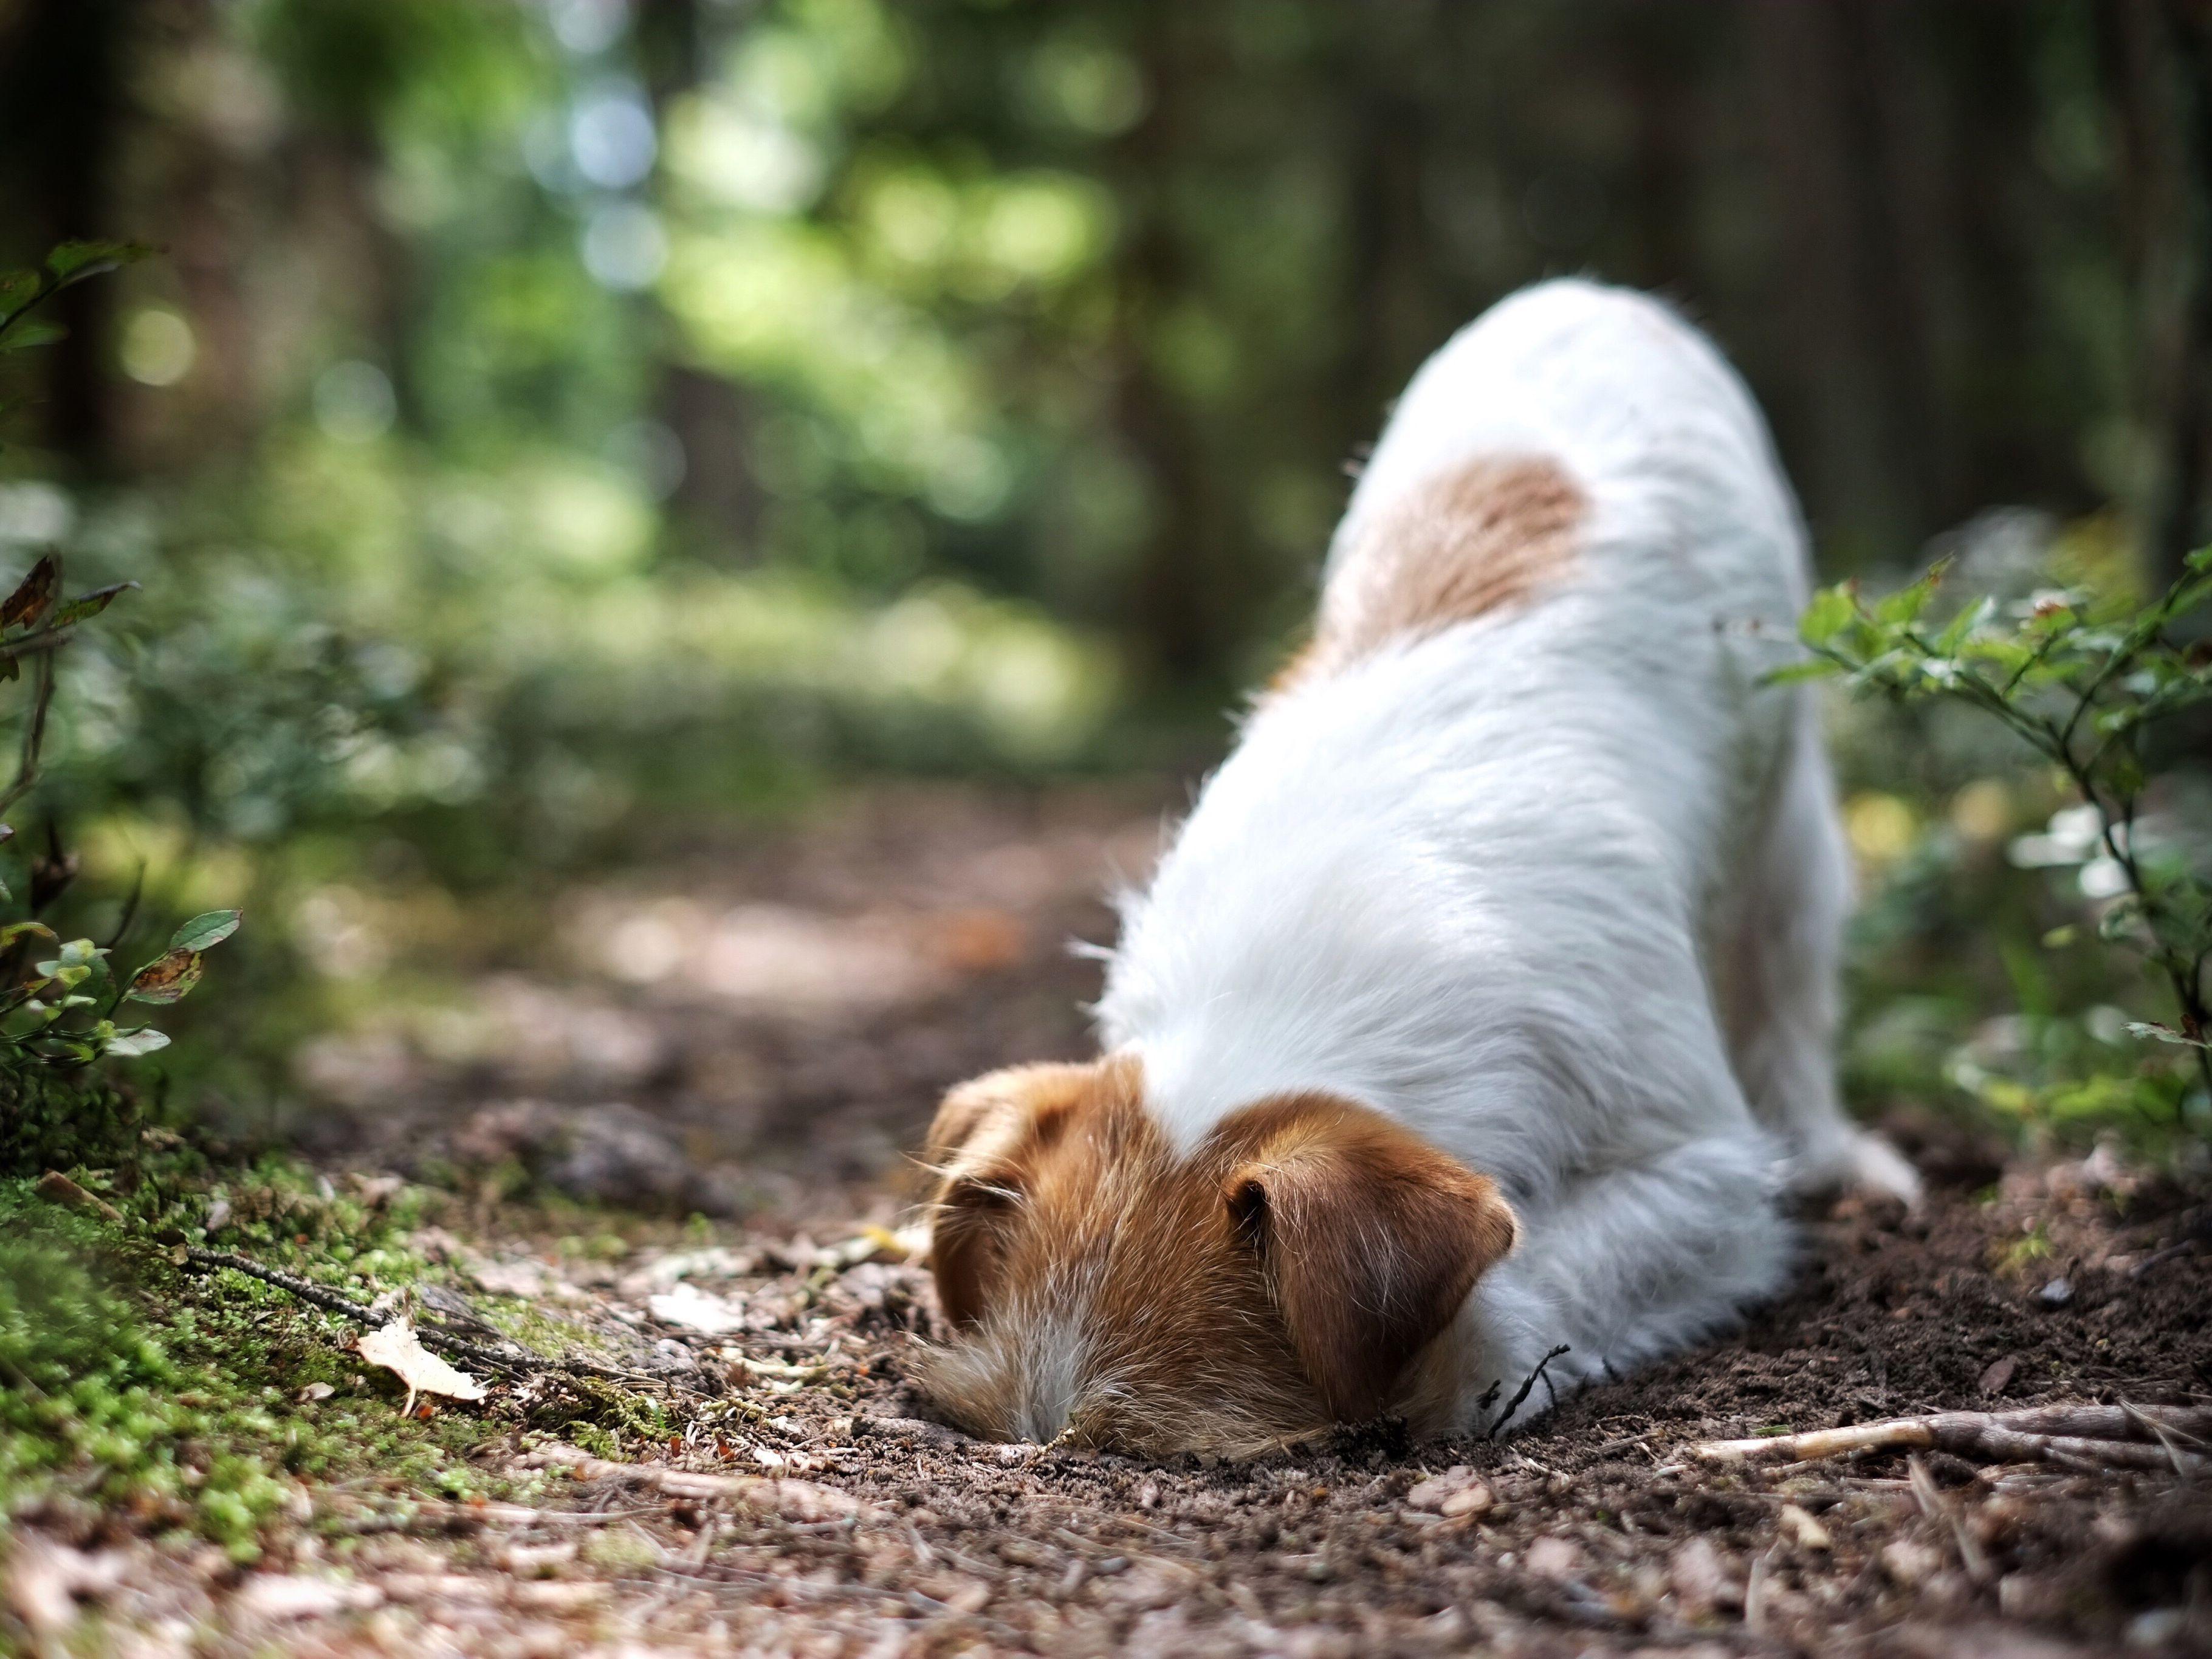 How to Treat Cuterebra in Pets